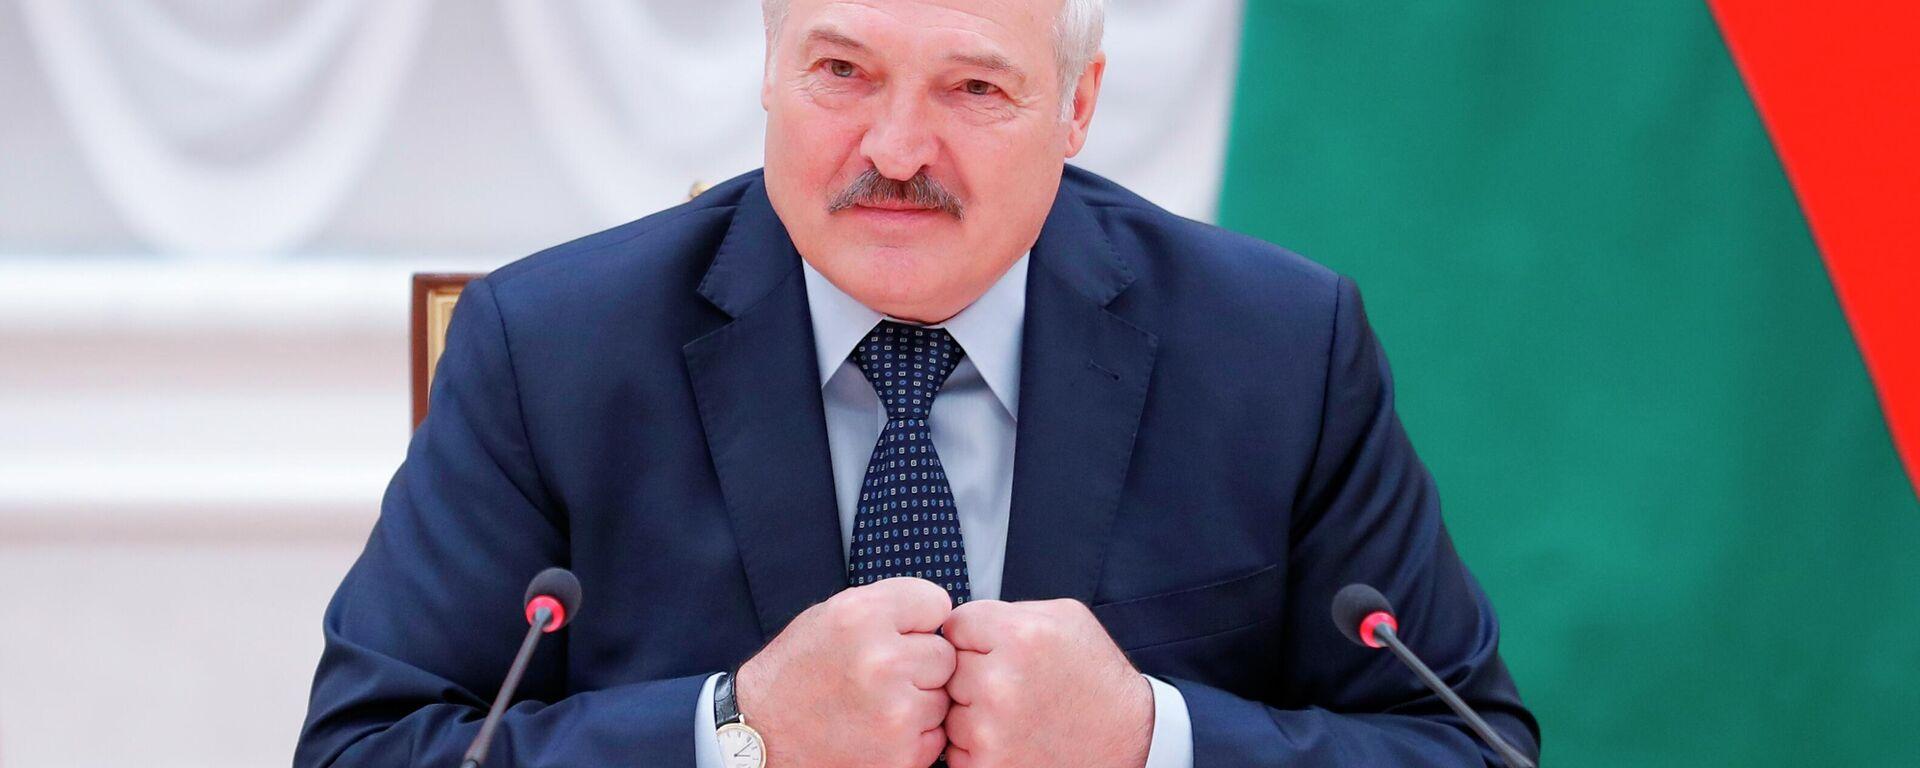 Президент Белоруссии Александр ЛукашенкоНГ - Sputnik Ўзбекистон, 1920, 05.08.2021